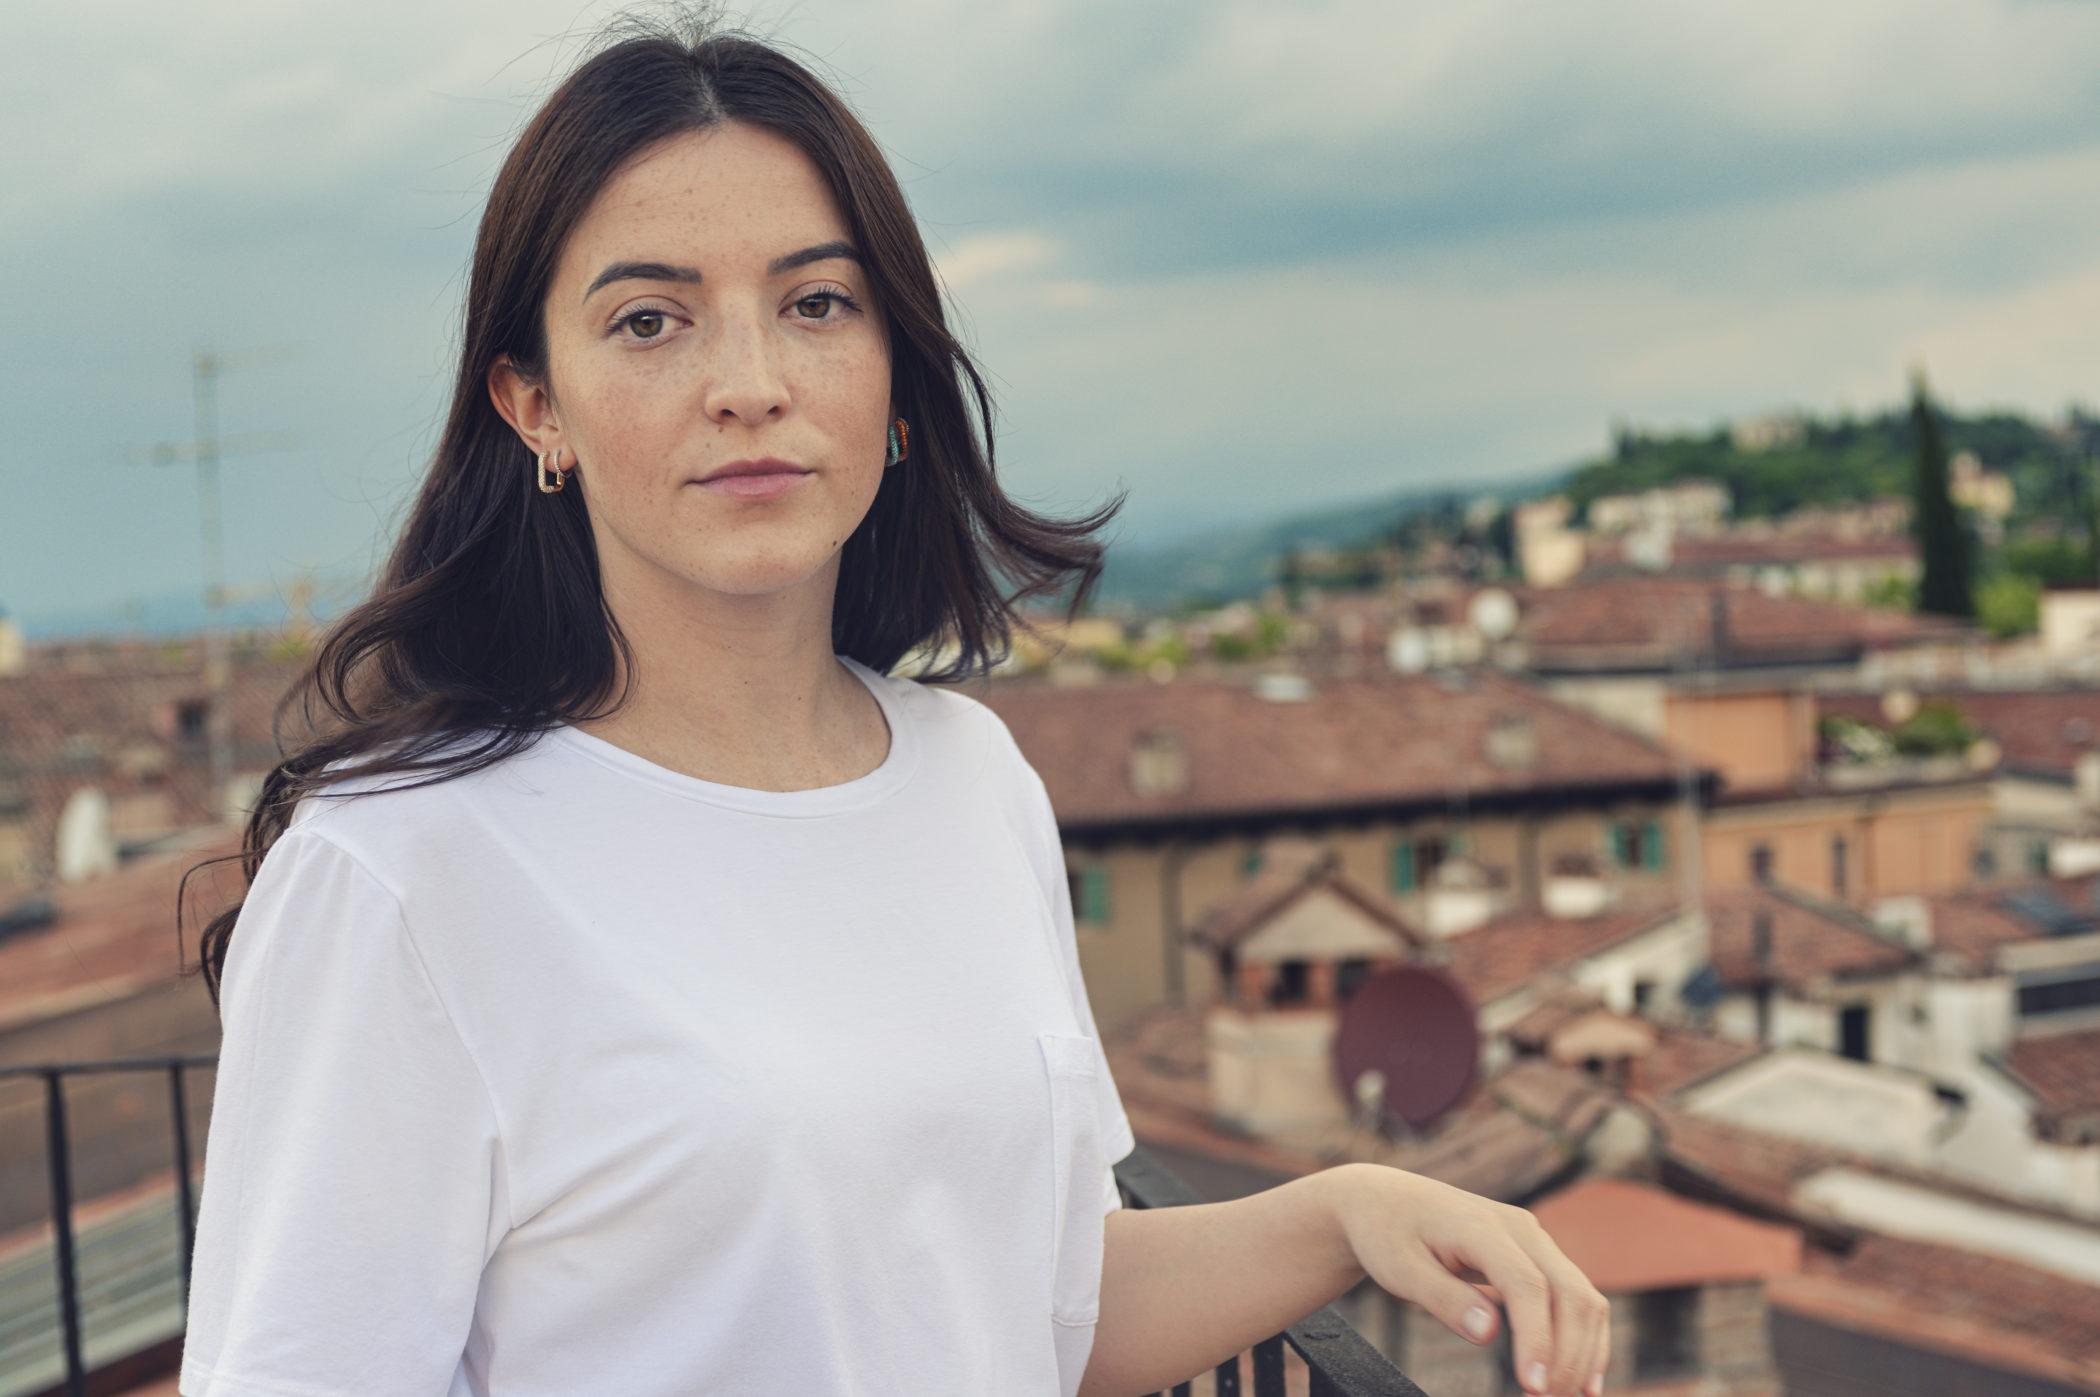 DSC6416 scaled - Alessia Verona